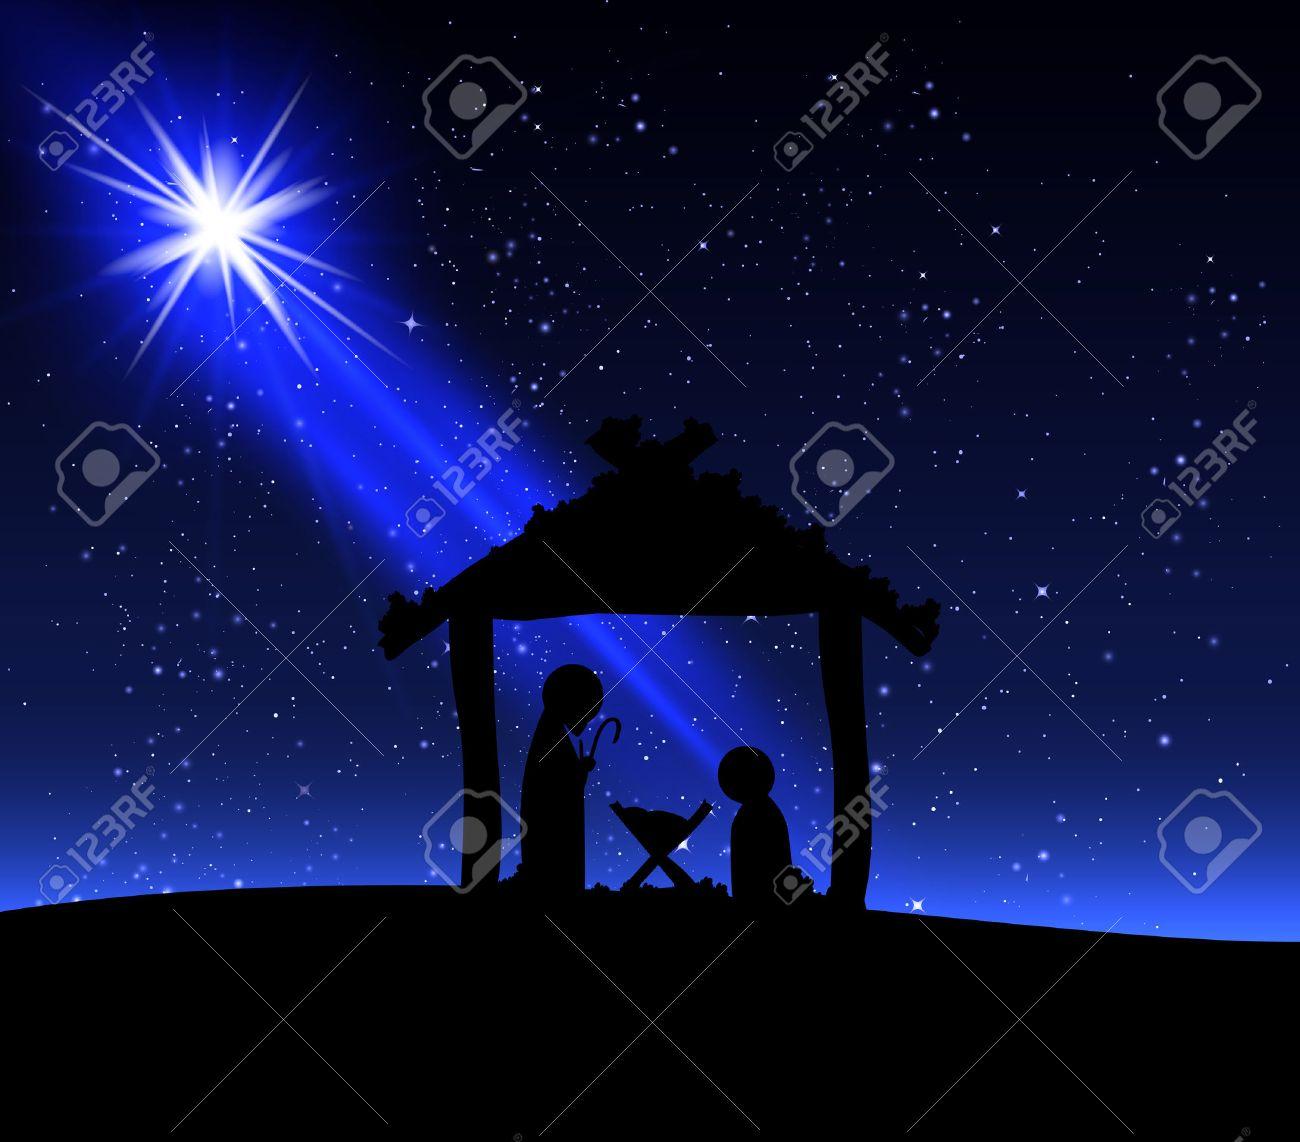 Jesus on the night of Christmas, vector art illustration. - 49354135